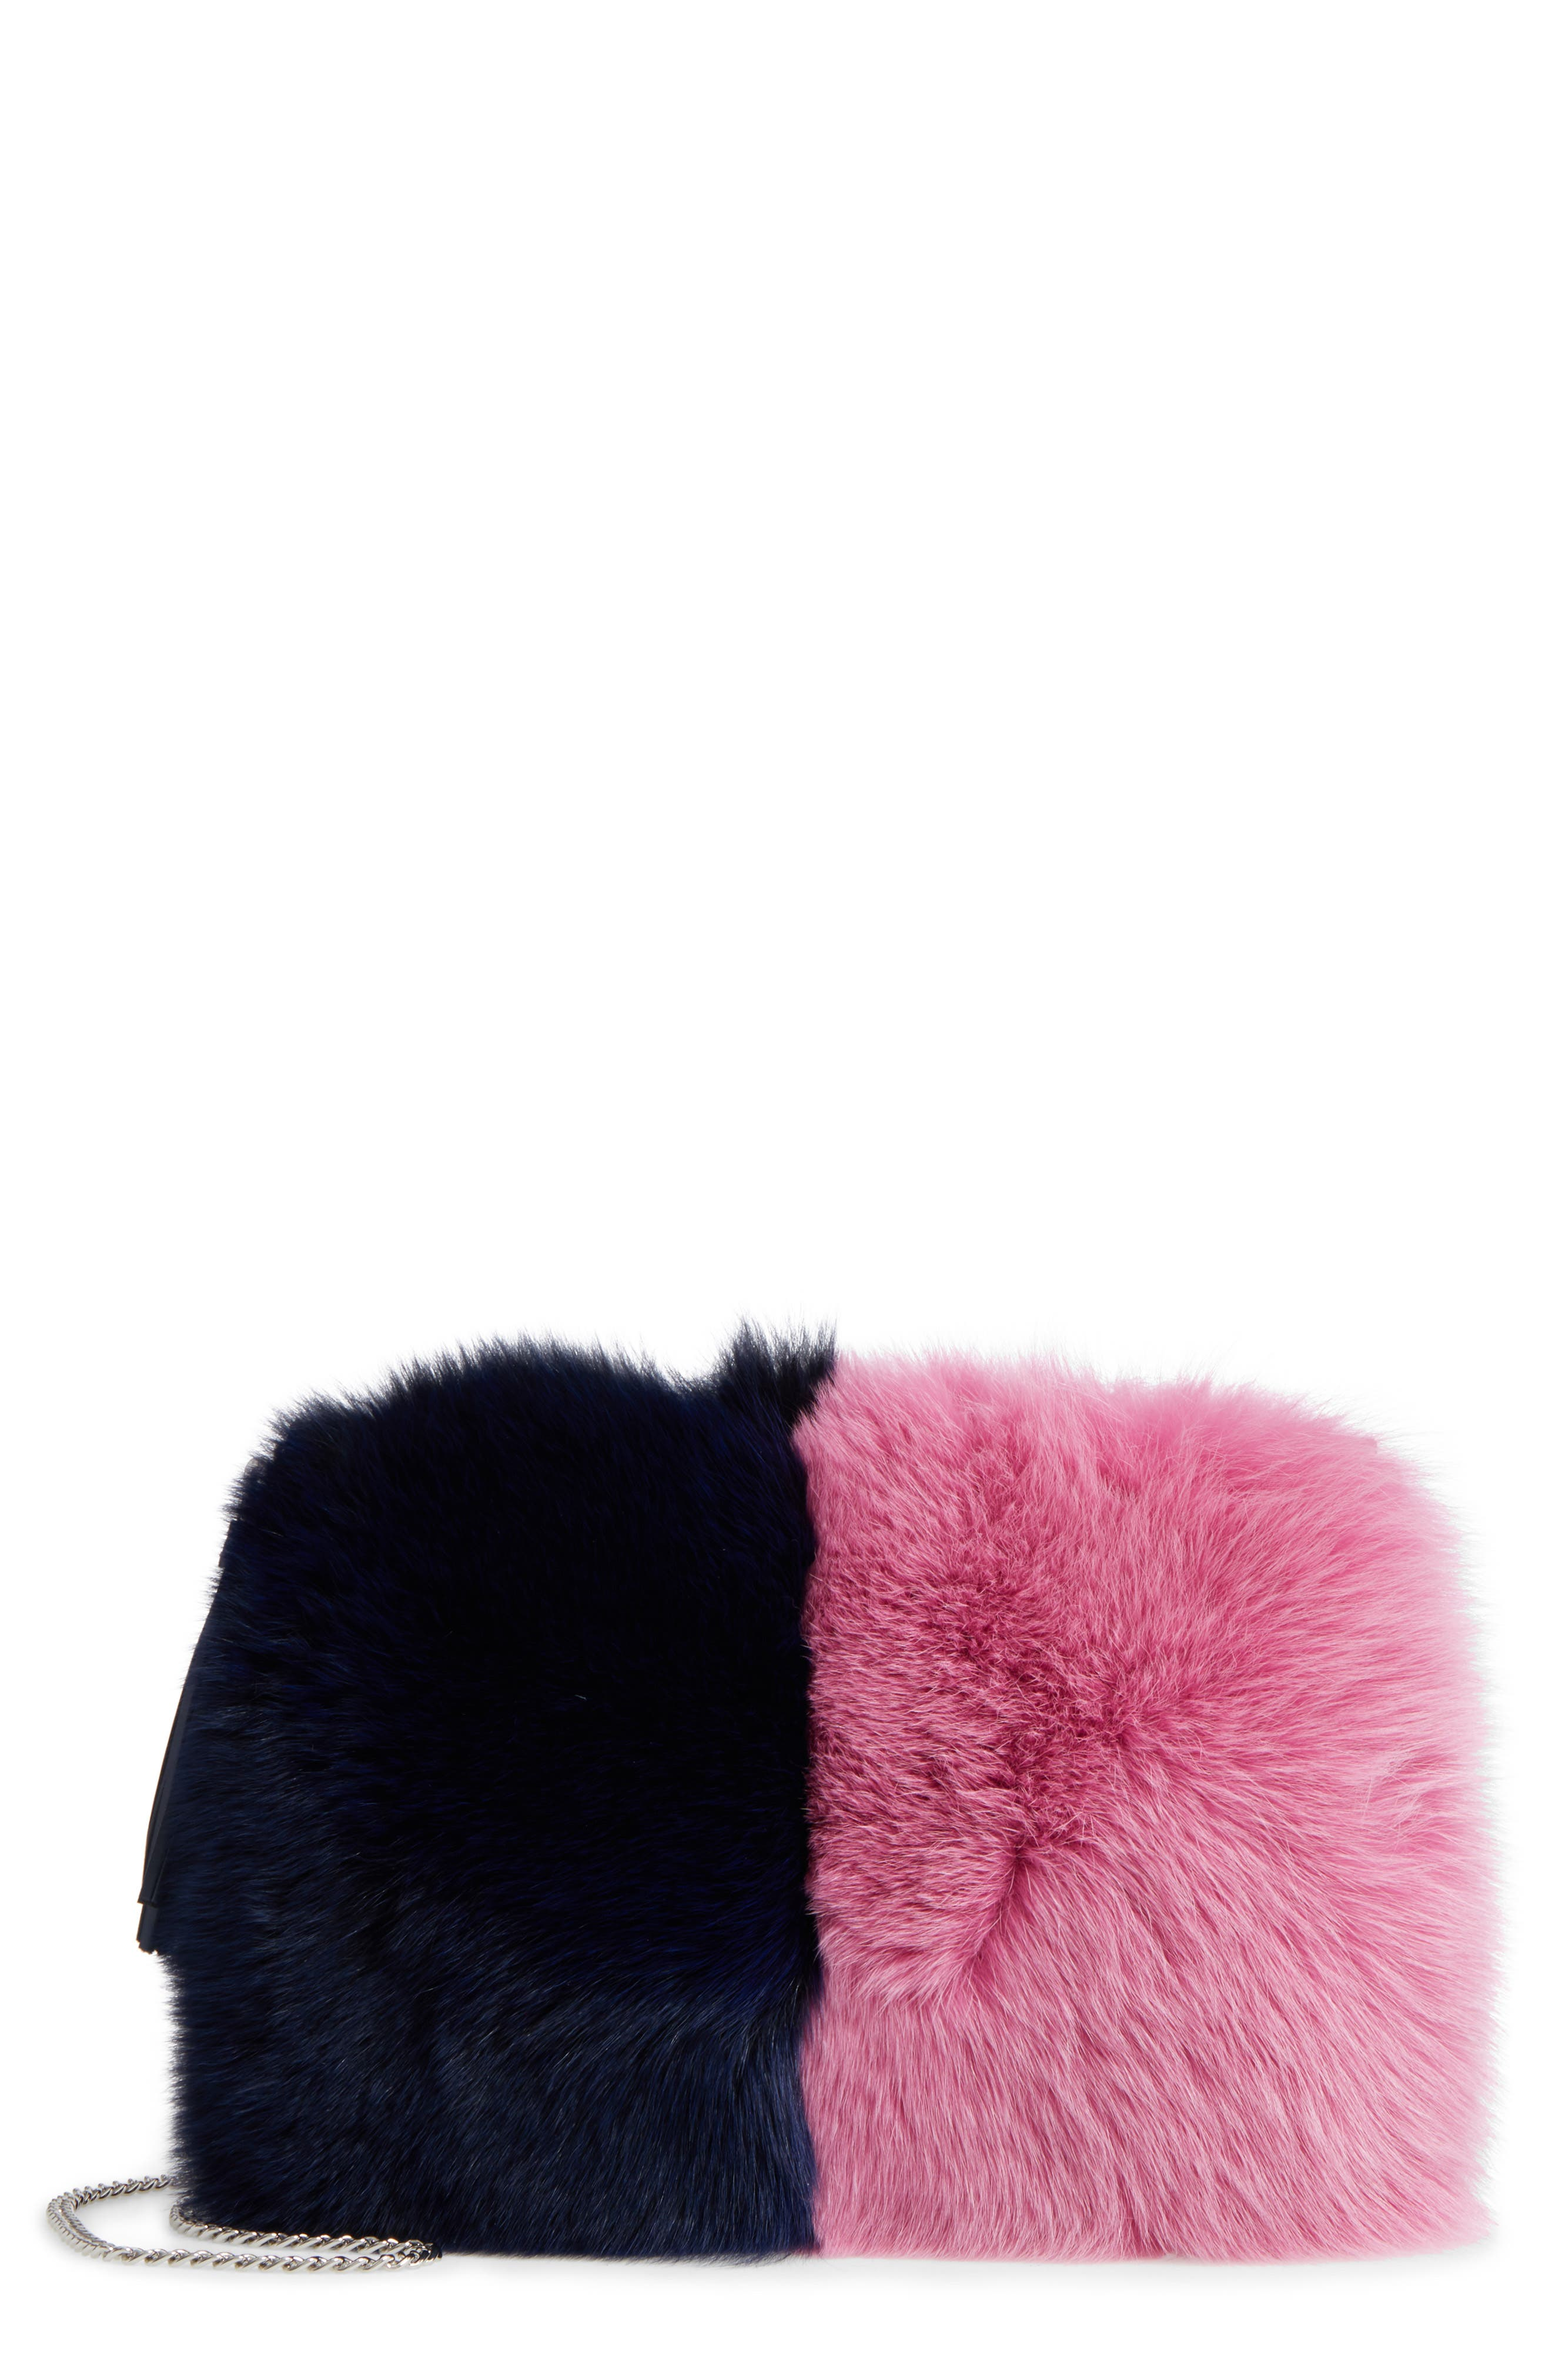 Loeffler Randall Genuine Fox Fur Tassel Pouch